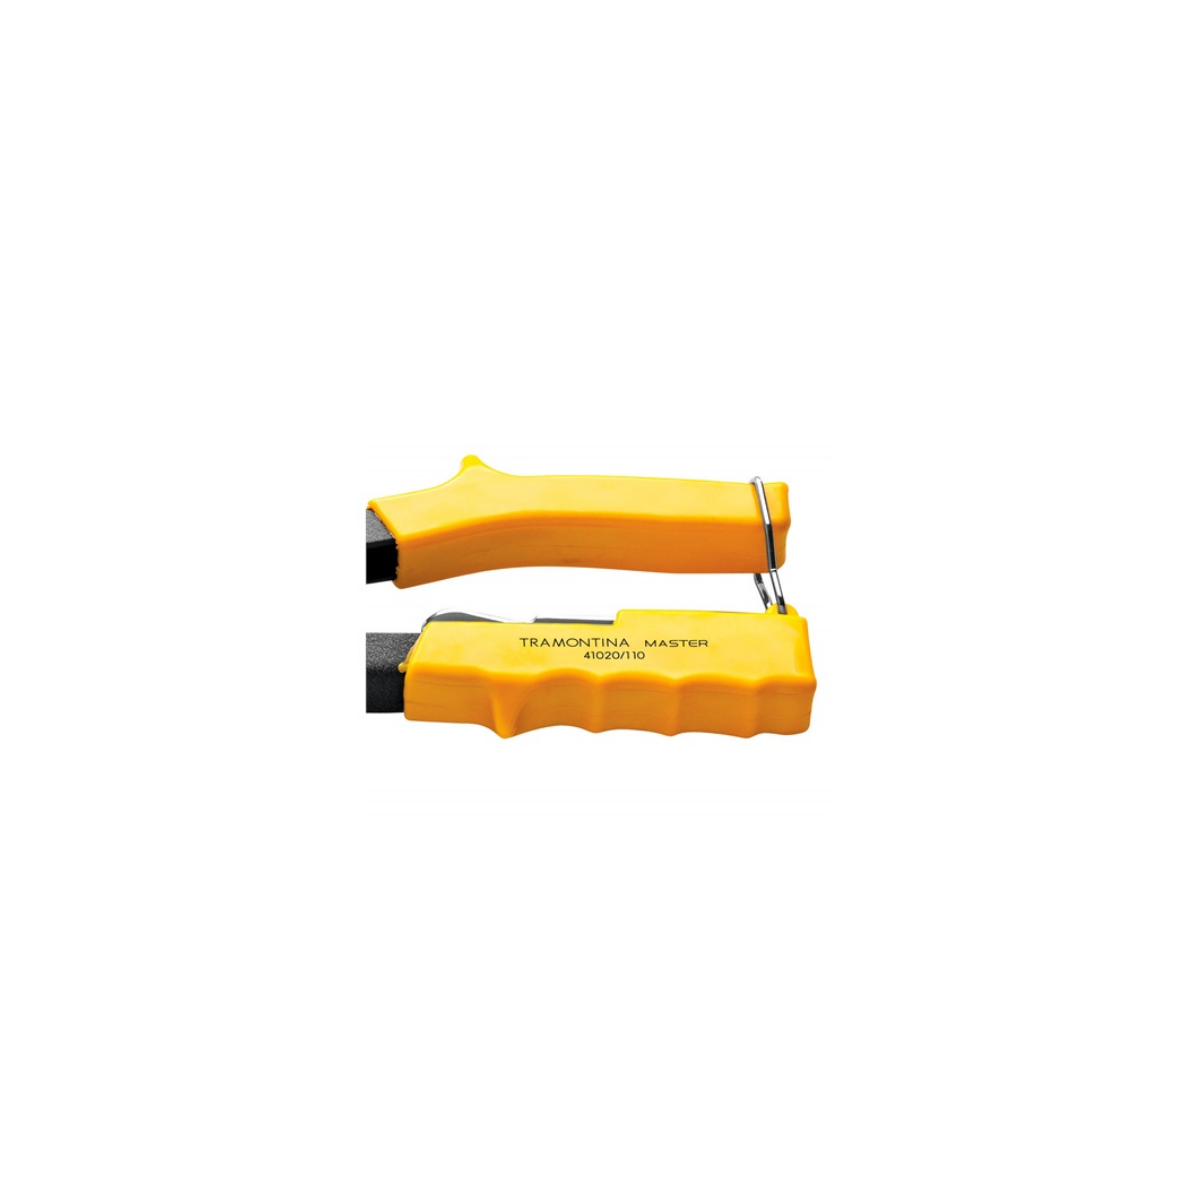 Alicate Rebitador 10 Polegadas 41020/110 Tramontina Master